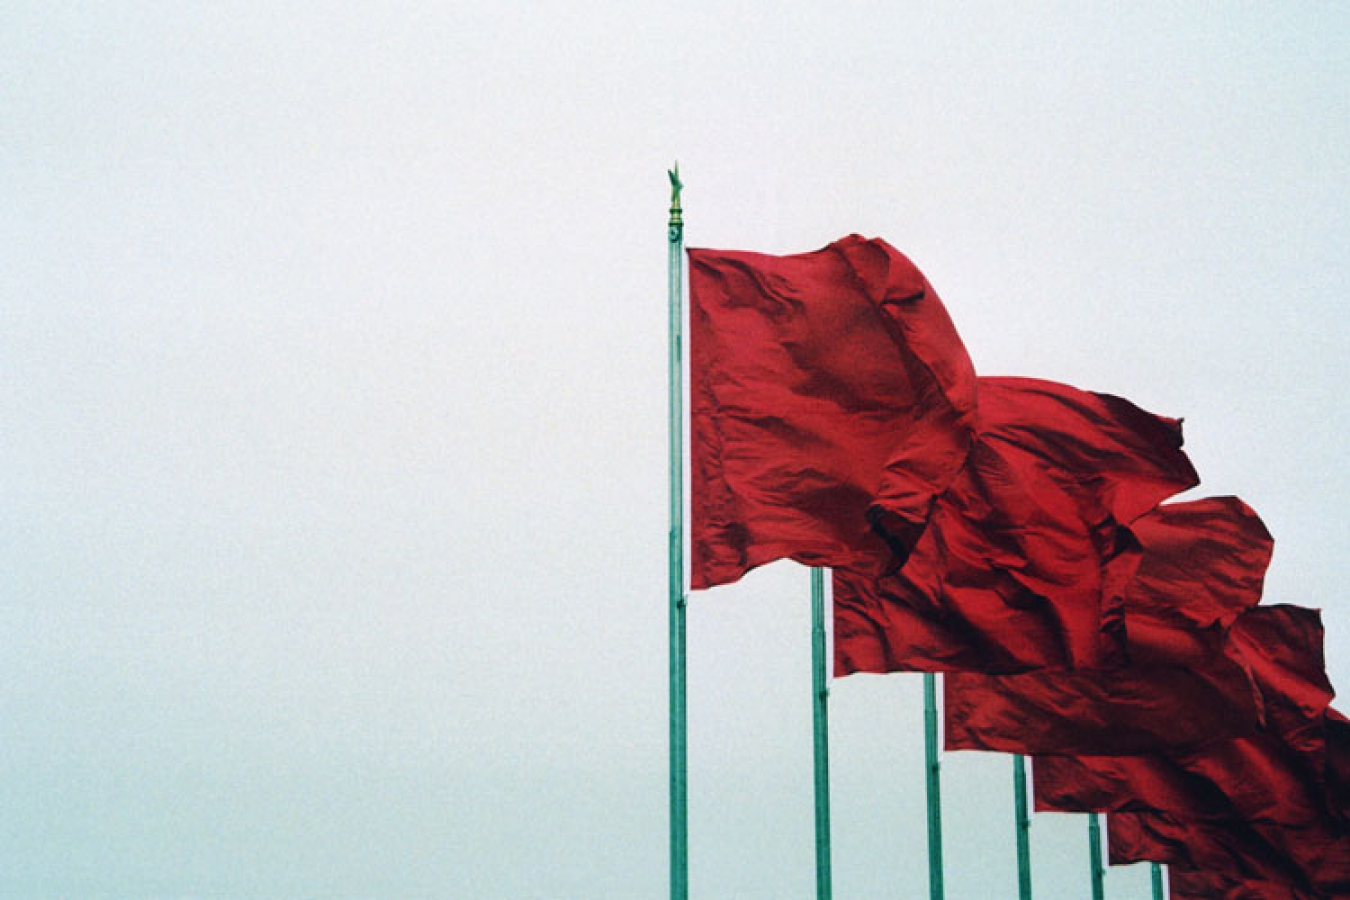 Tianamen Square China, Flags